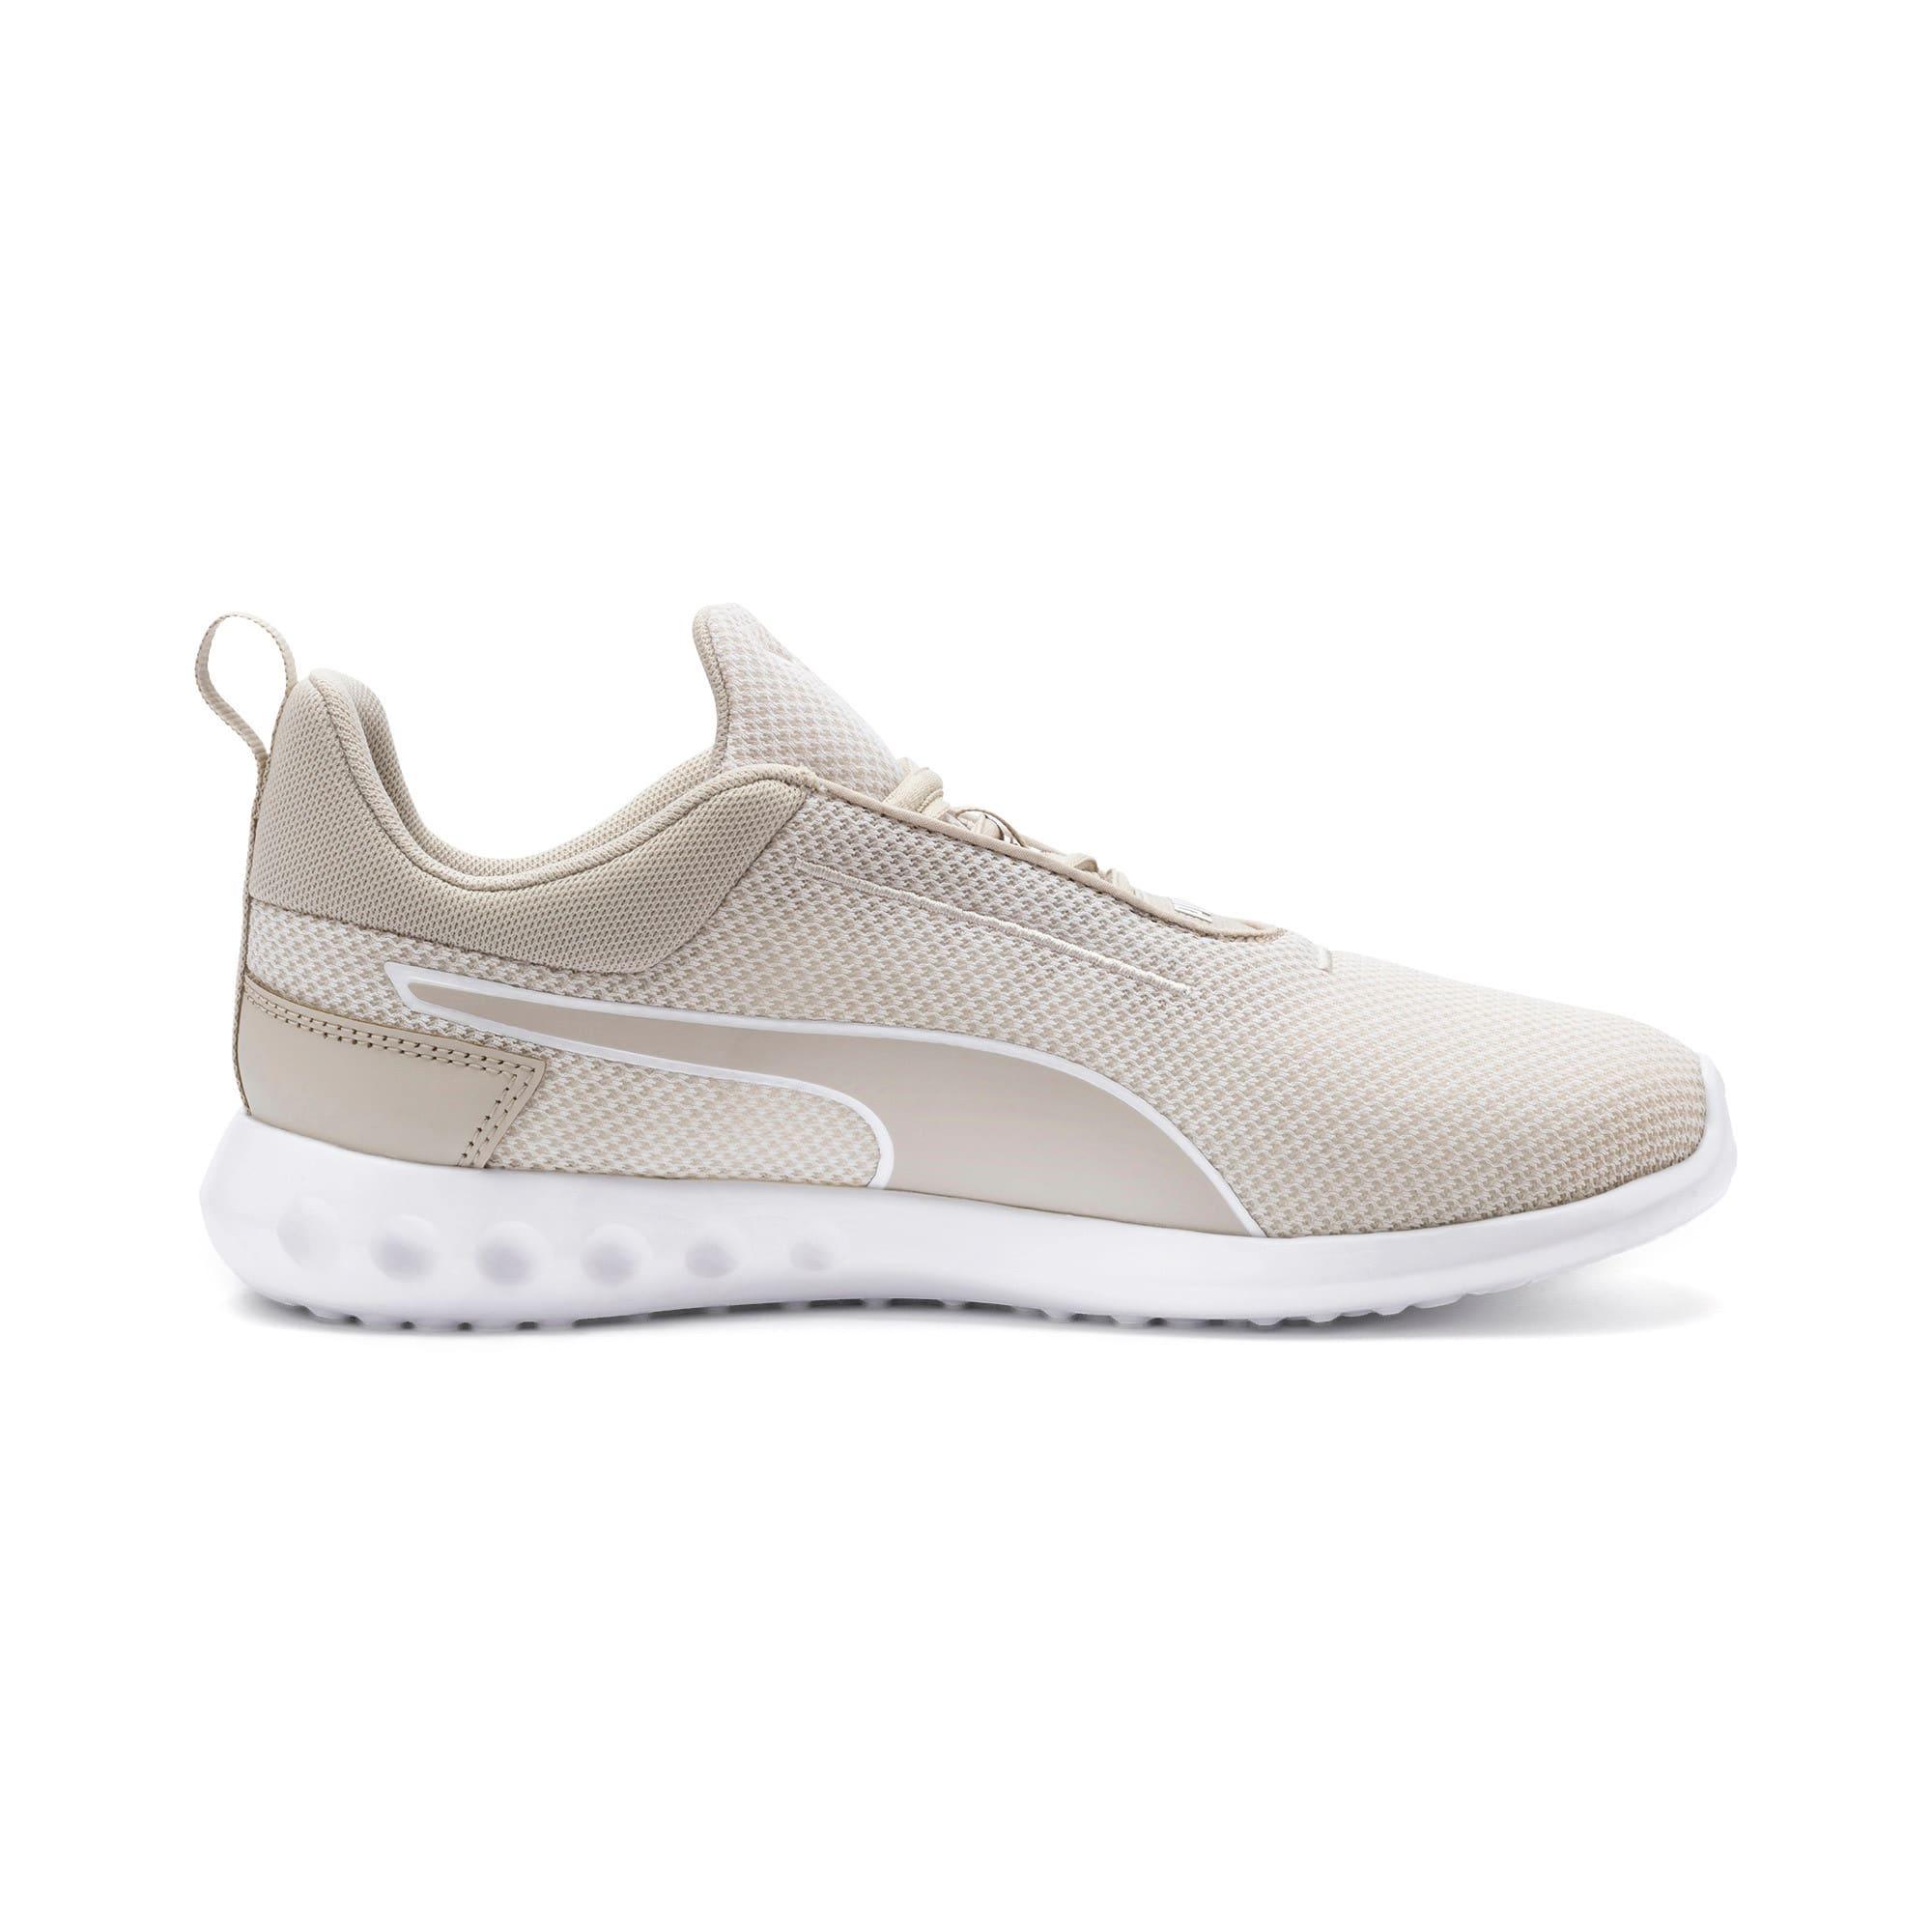 Thumbnail 5 of Carson 2 Concave Women's Training Shoes, Silver Gray-Puma White, medium